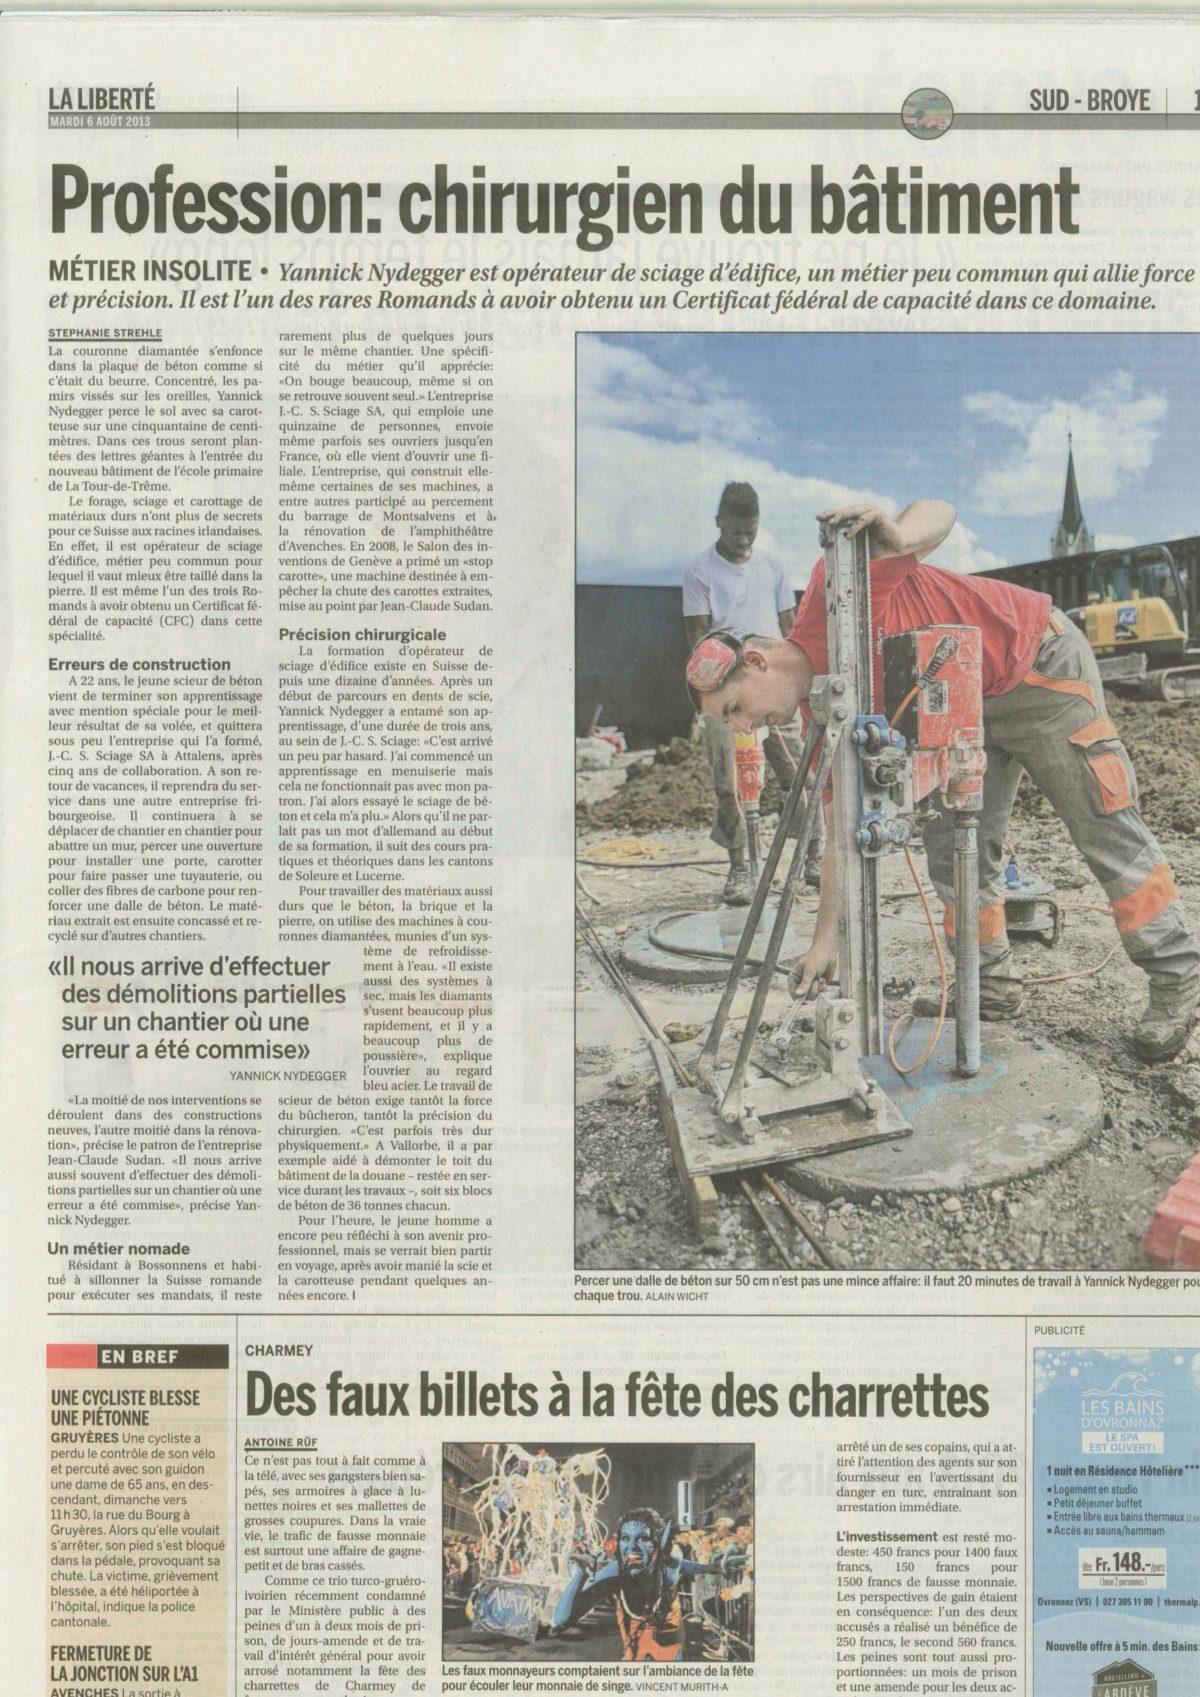 La Liberté; Mardi 6 Août 2013